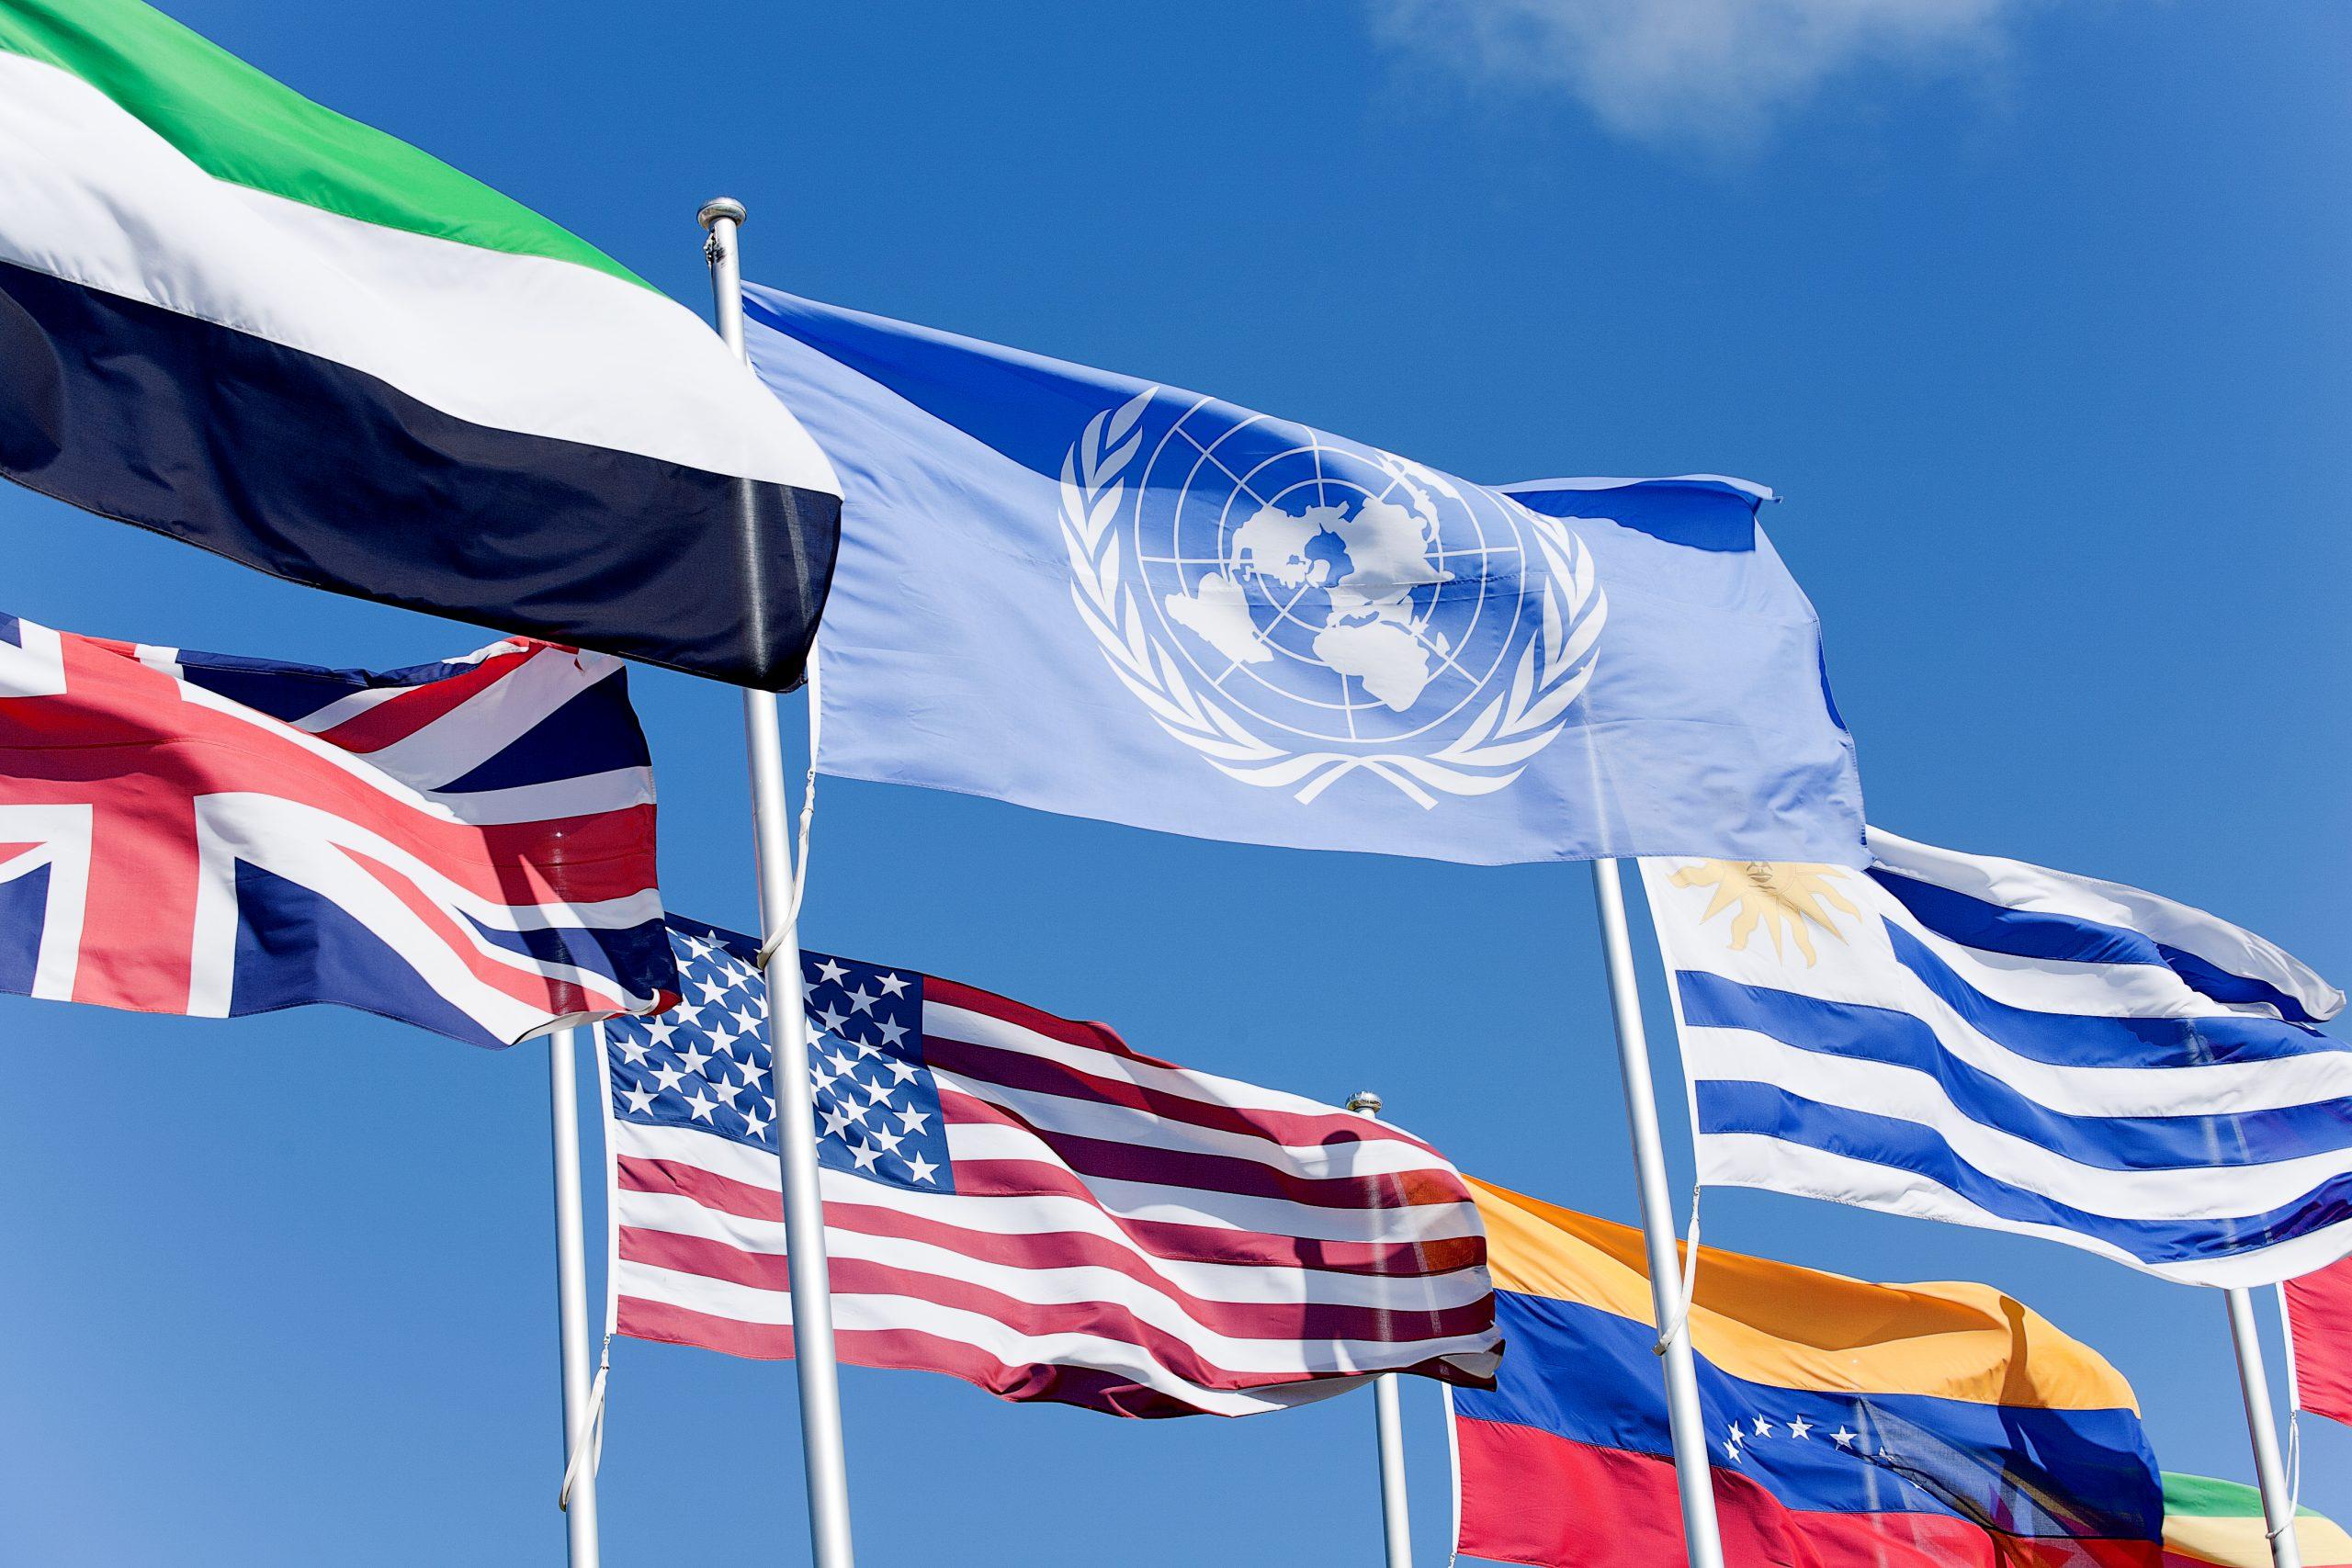 Пропагандист за 40 миллиардов: ООН опозорилась с докладом по Ливии